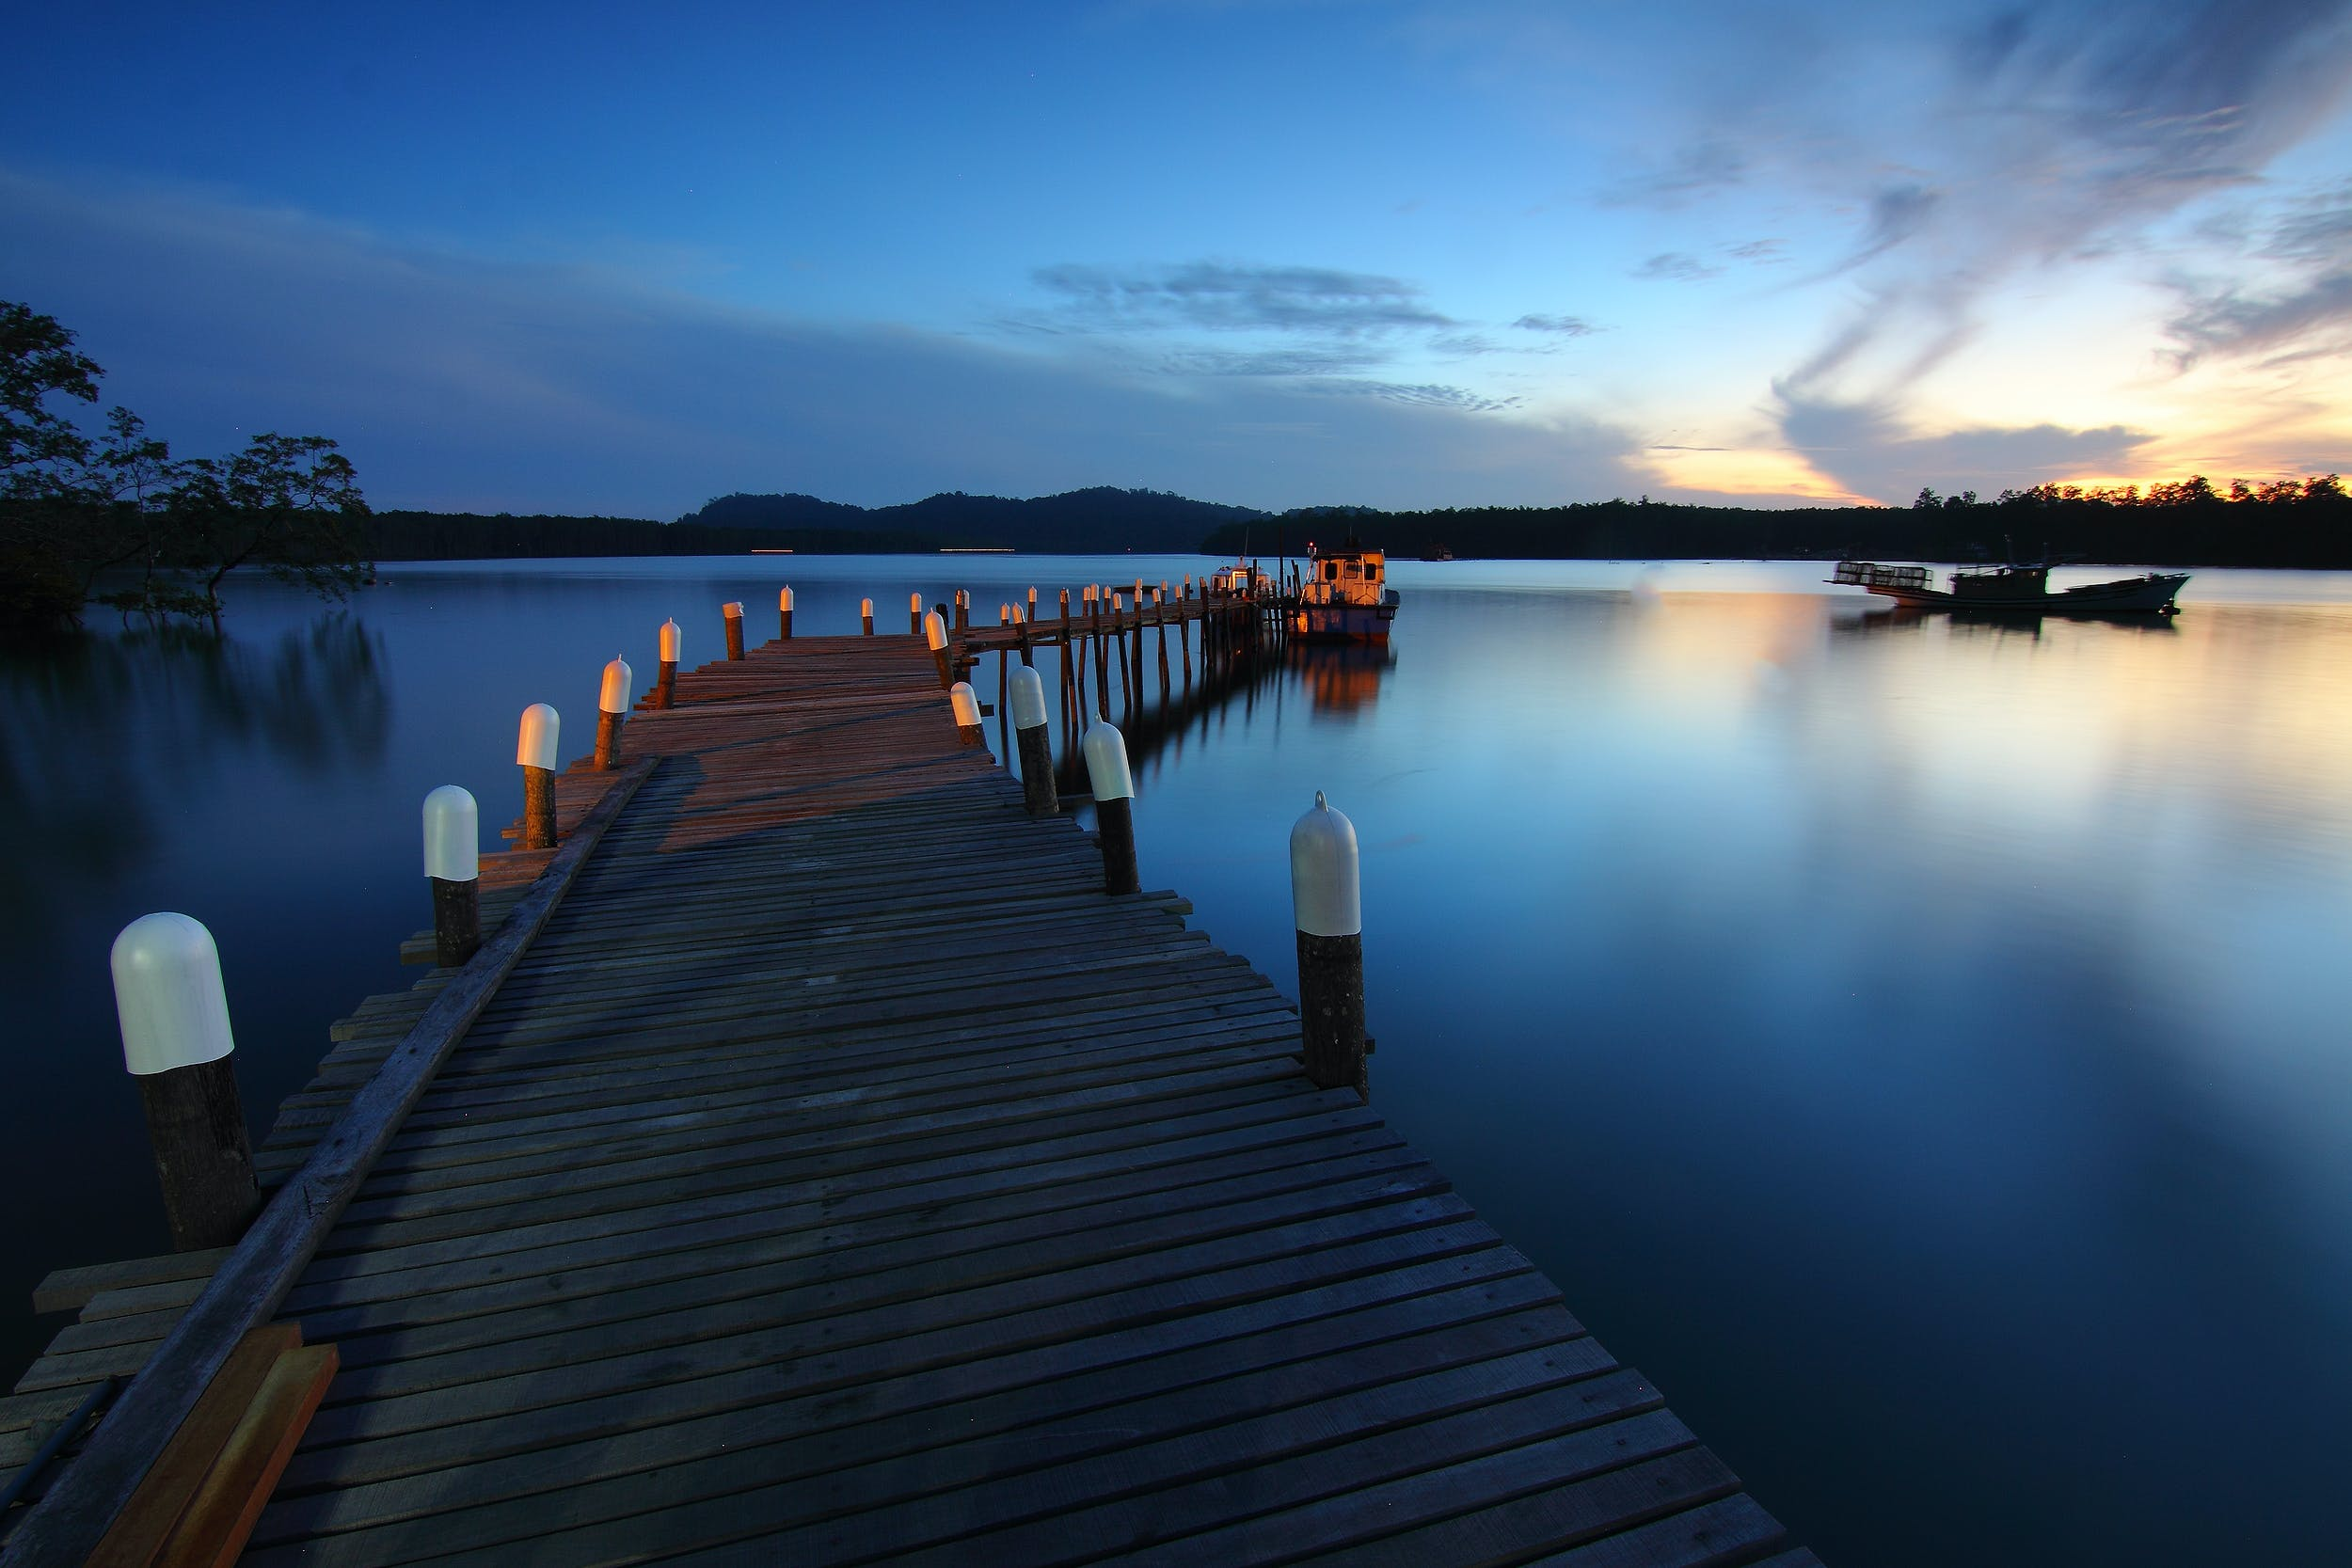 boat, calm waters, dawn